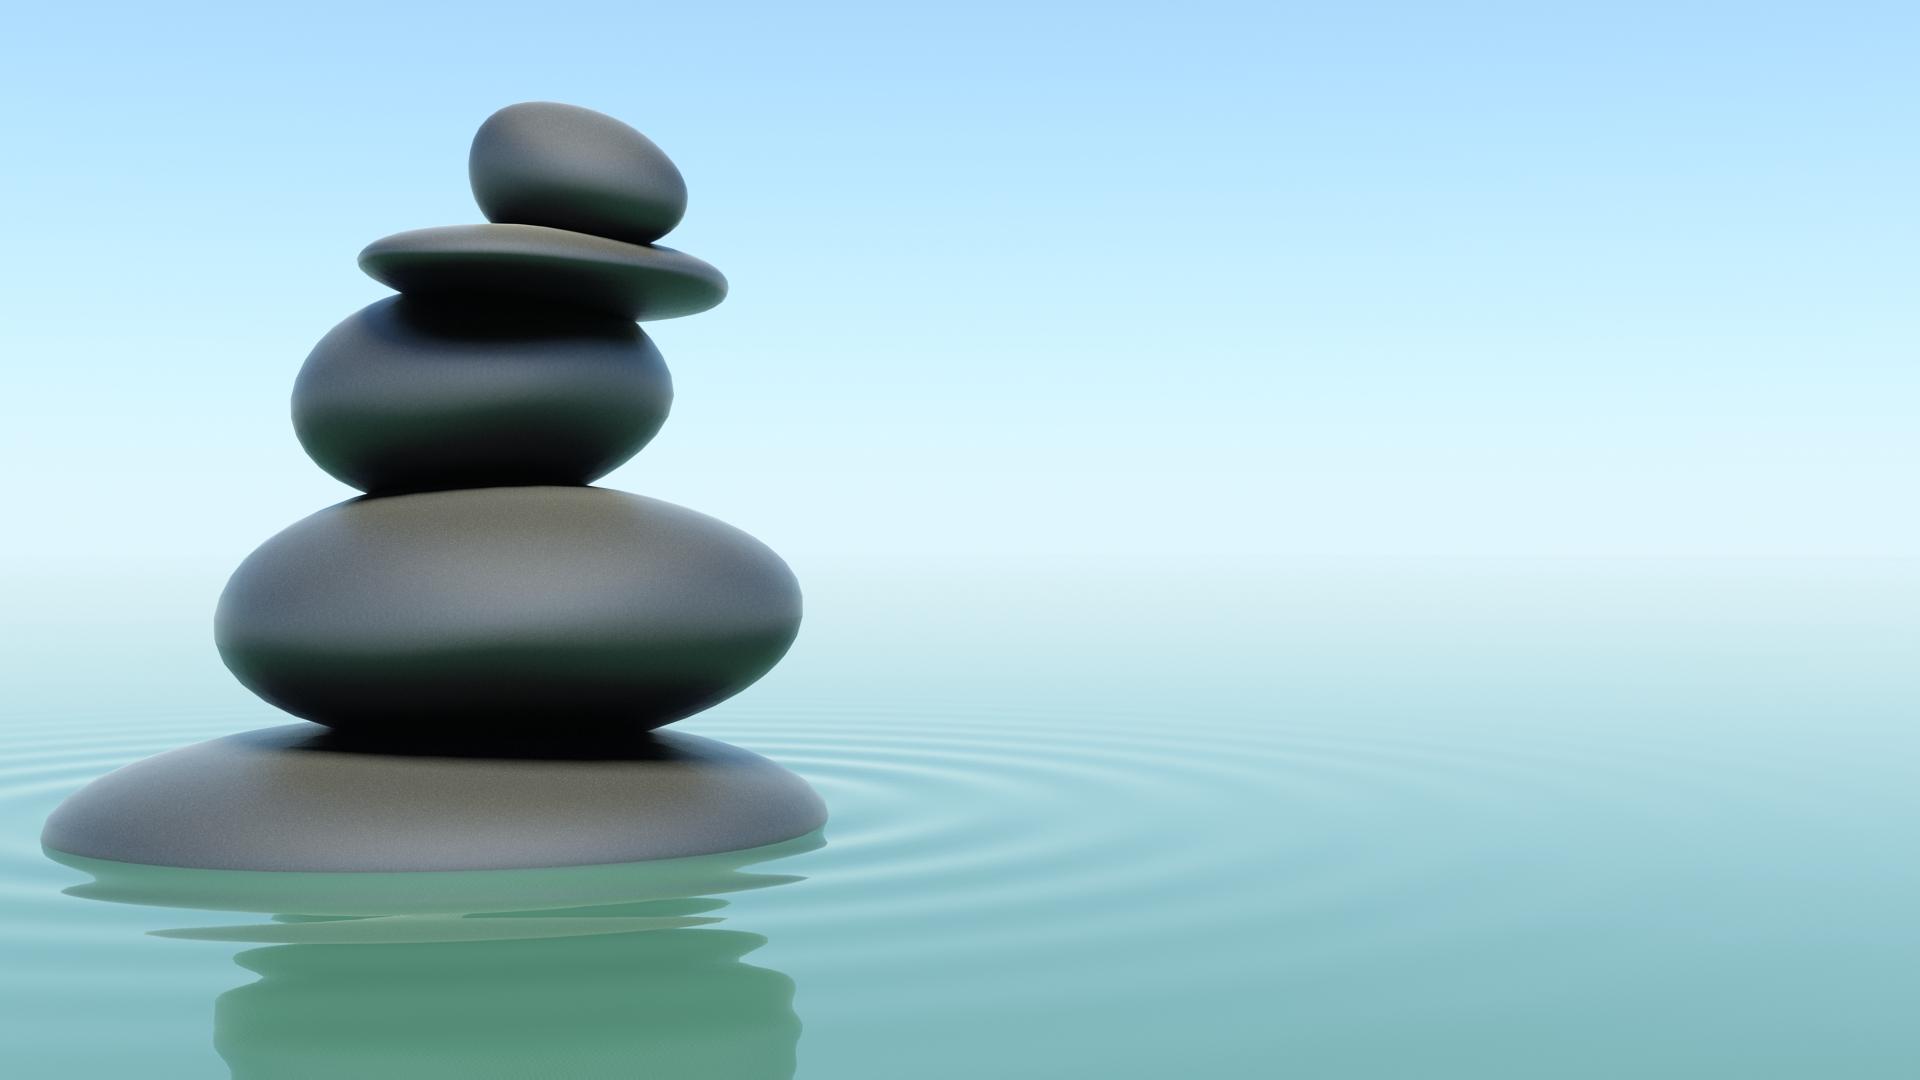 Free Zen Desktop Wallpaper - WallpaperSafari